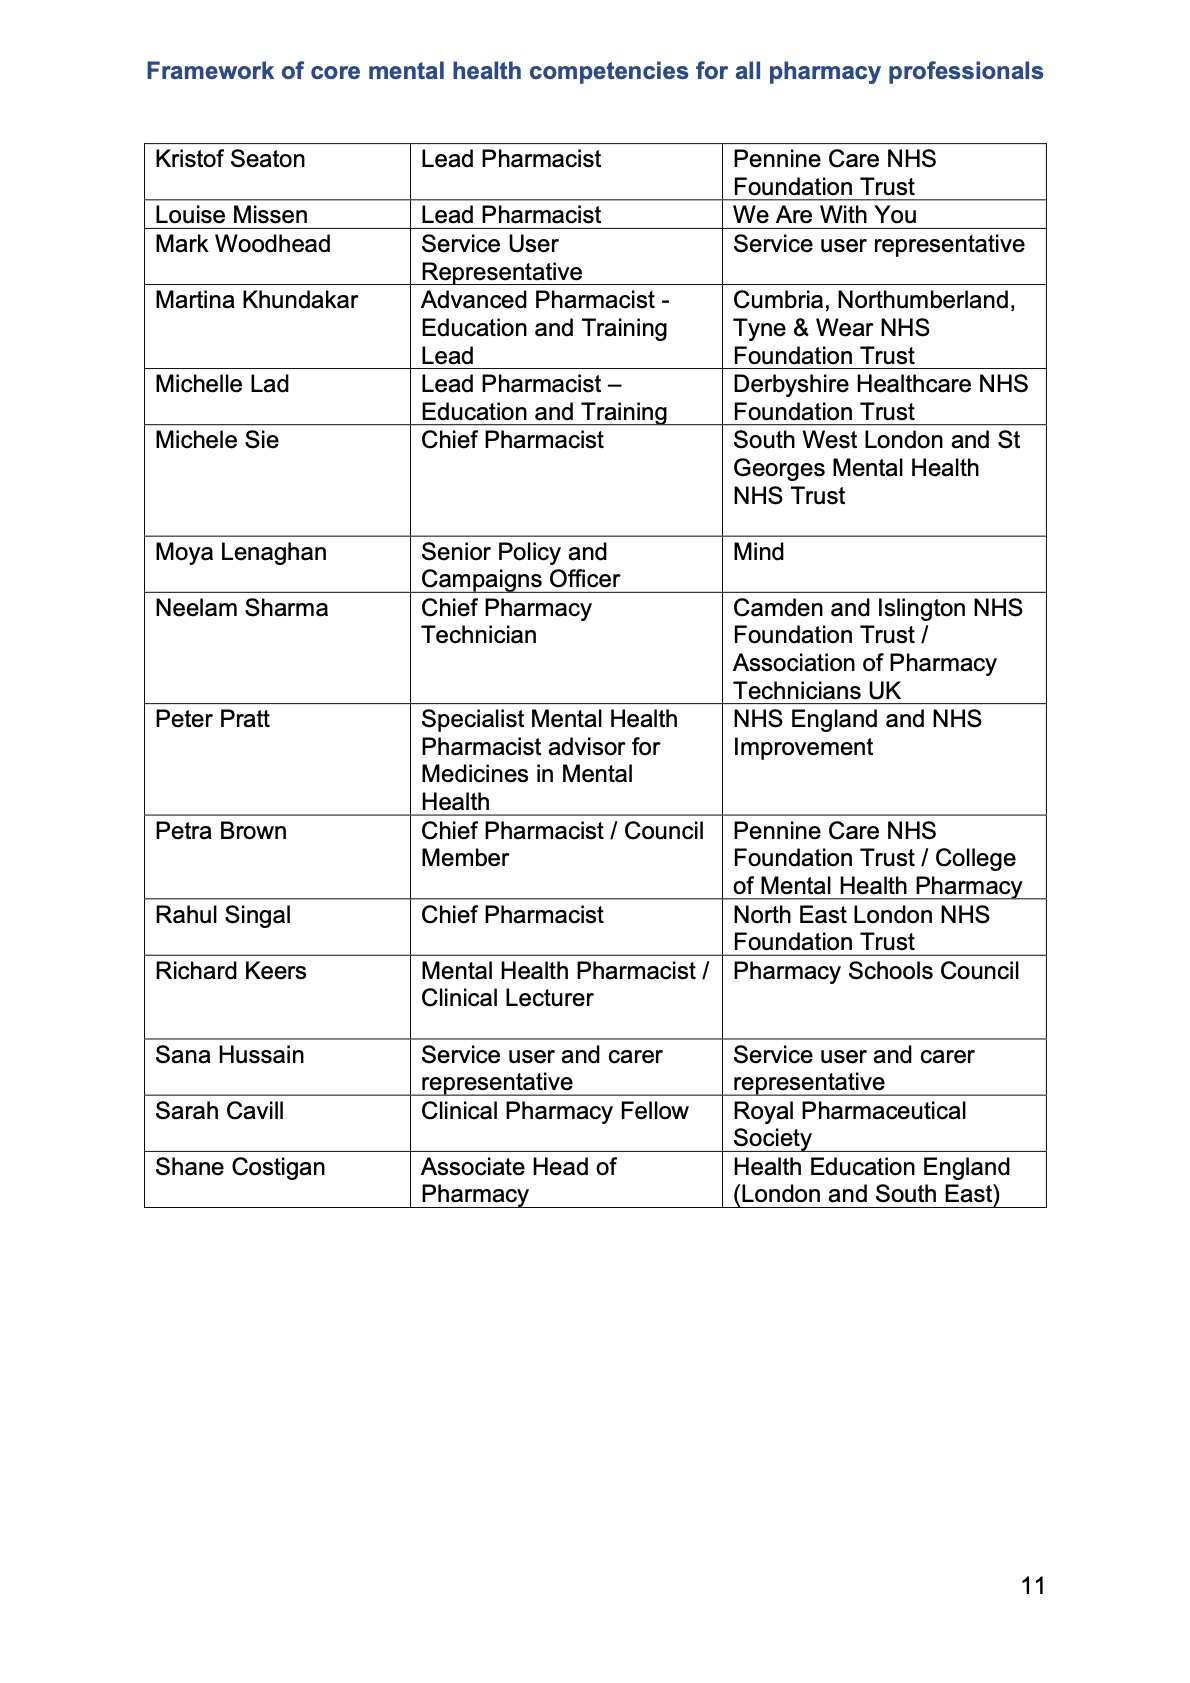 JPEG 11 Pharmacy Framework 2020 (2)